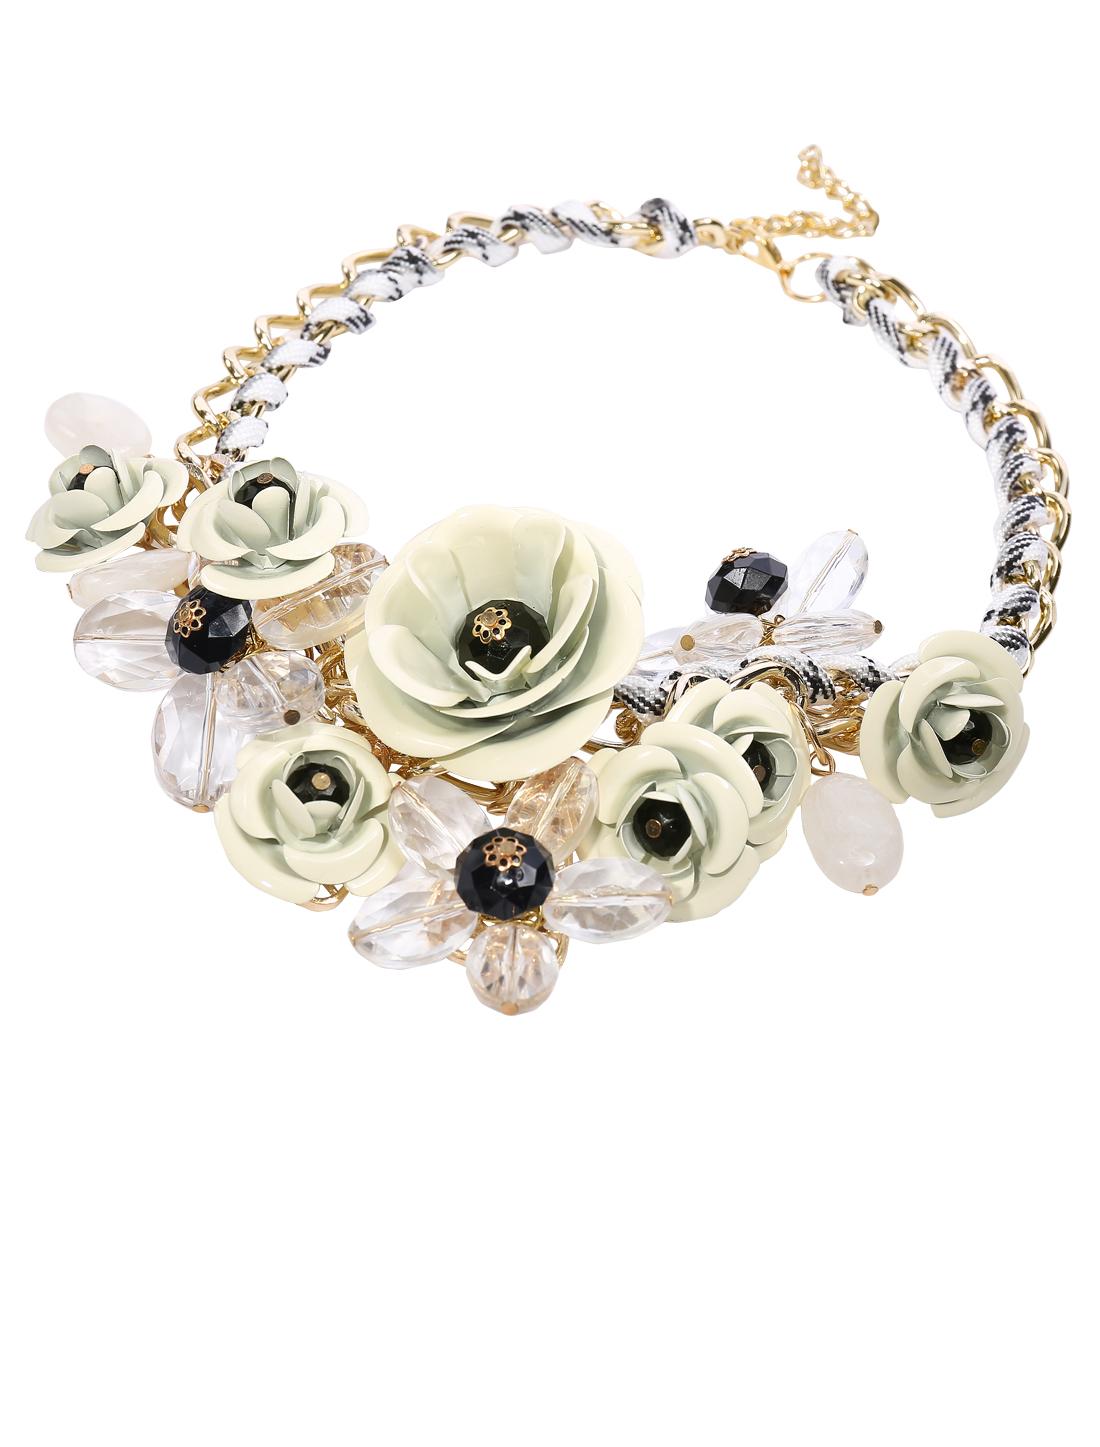 Gold Chain Crystal White Flower Statement Pendant Bib Necklace Choker